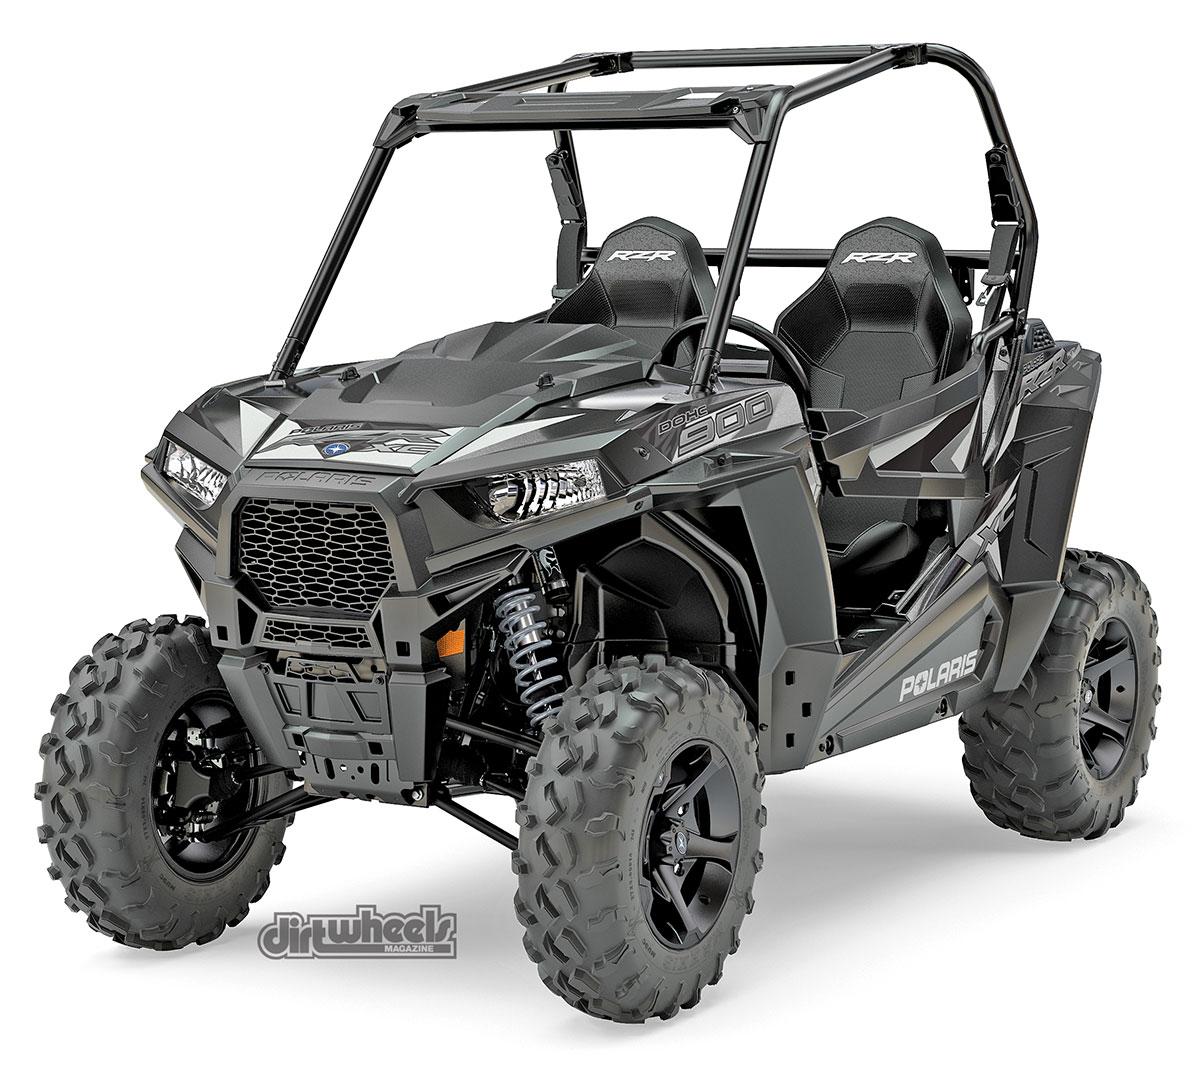 70-2017-rzr-900-eps-xc-edition